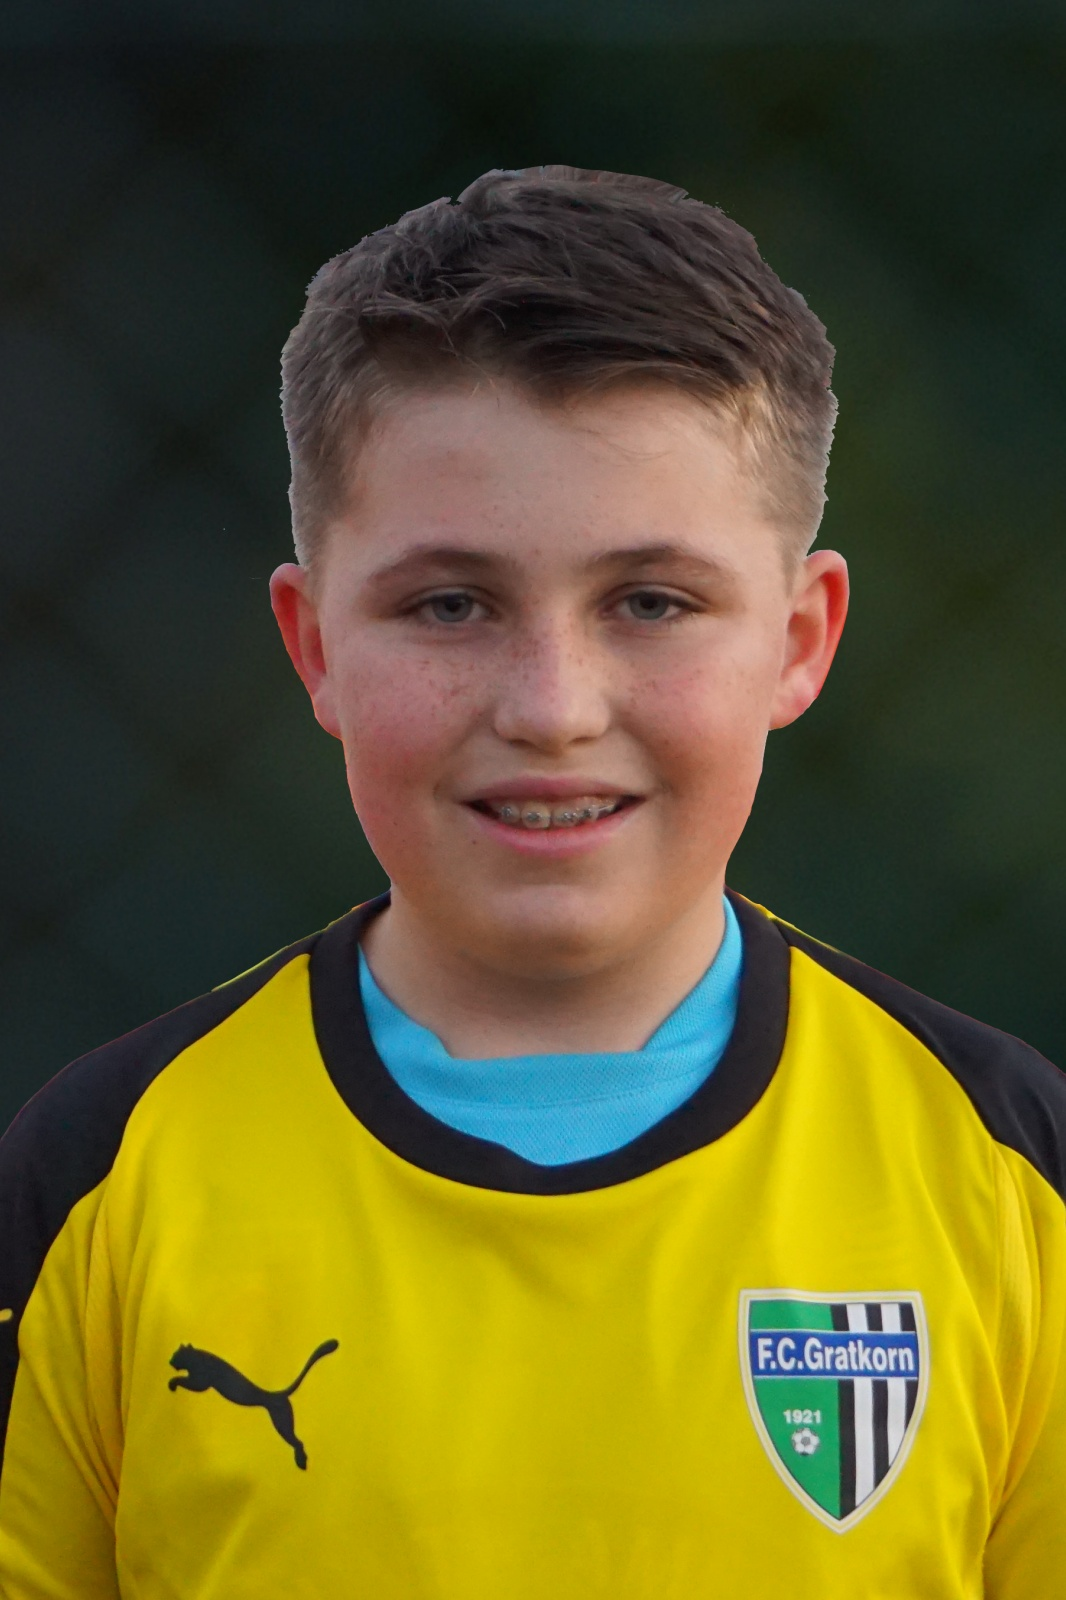 Paul Polheim, FC Gratkorn U13